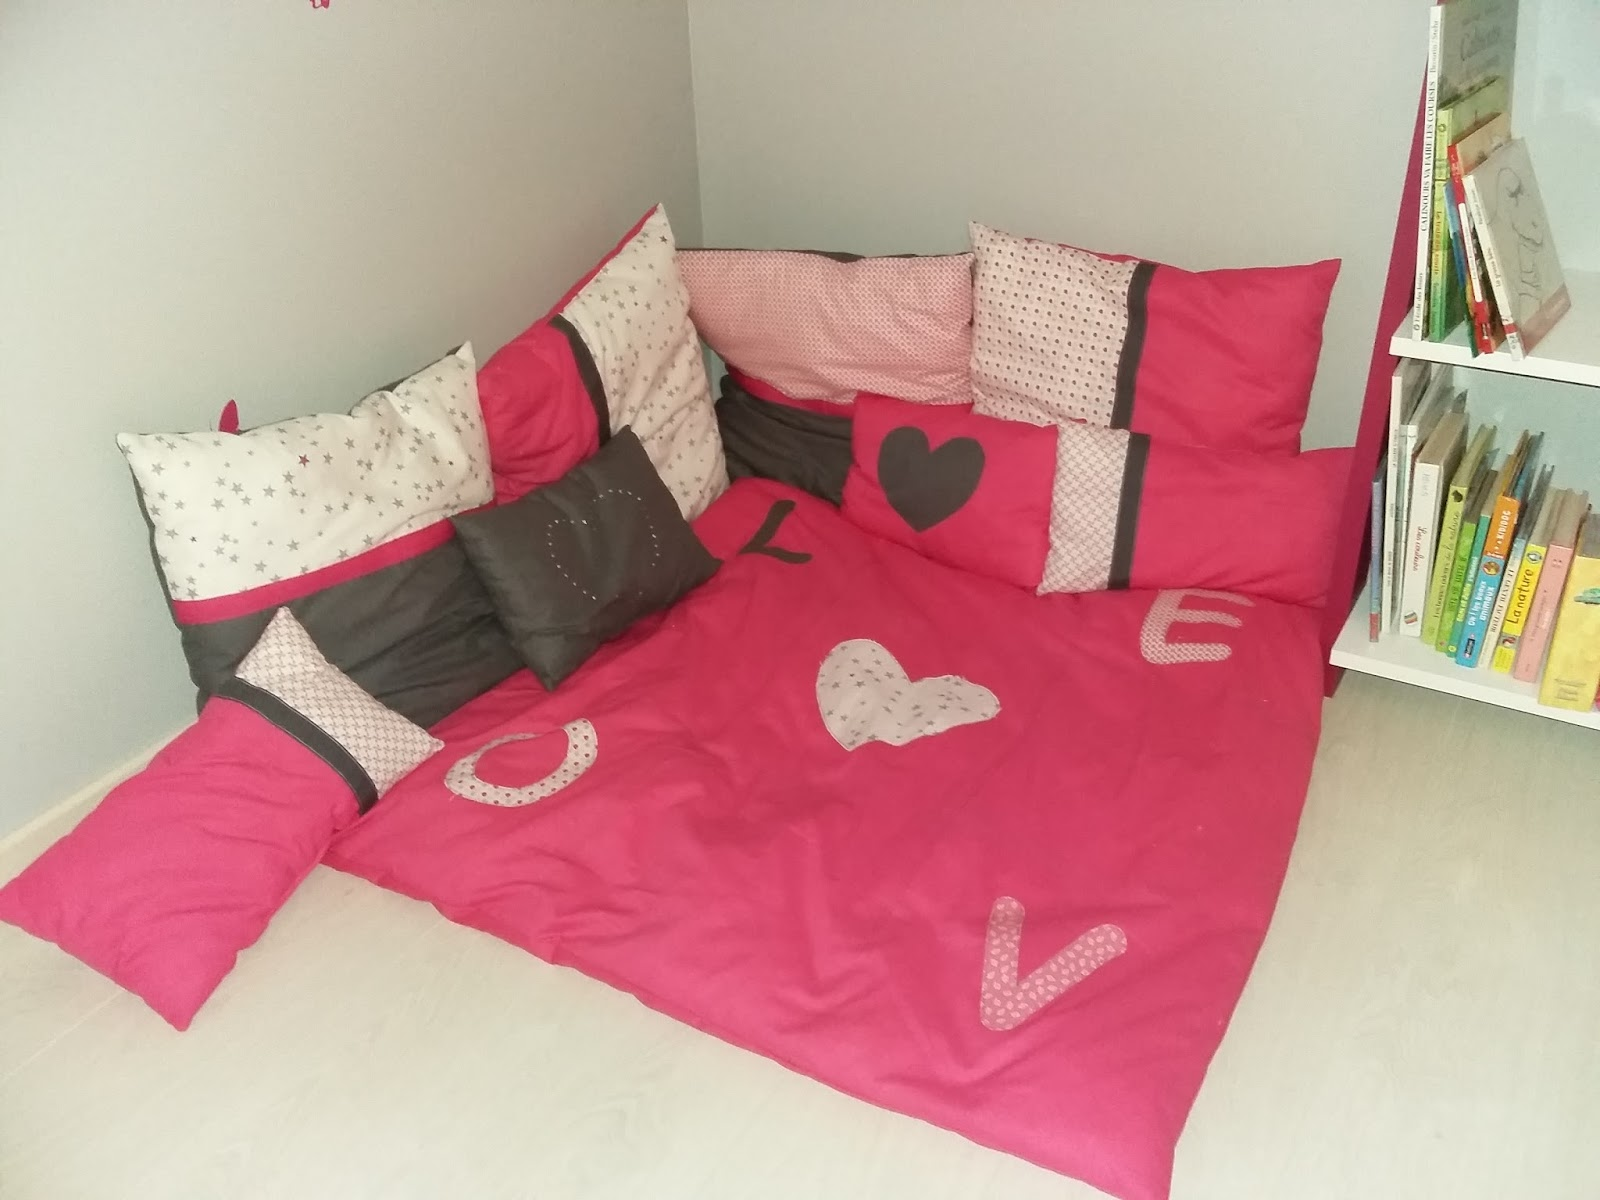 coin lecture enfant coin lecture pour les petits tapis oreiller fille coussins dtente angle. Black Bedroom Furniture Sets. Home Design Ideas